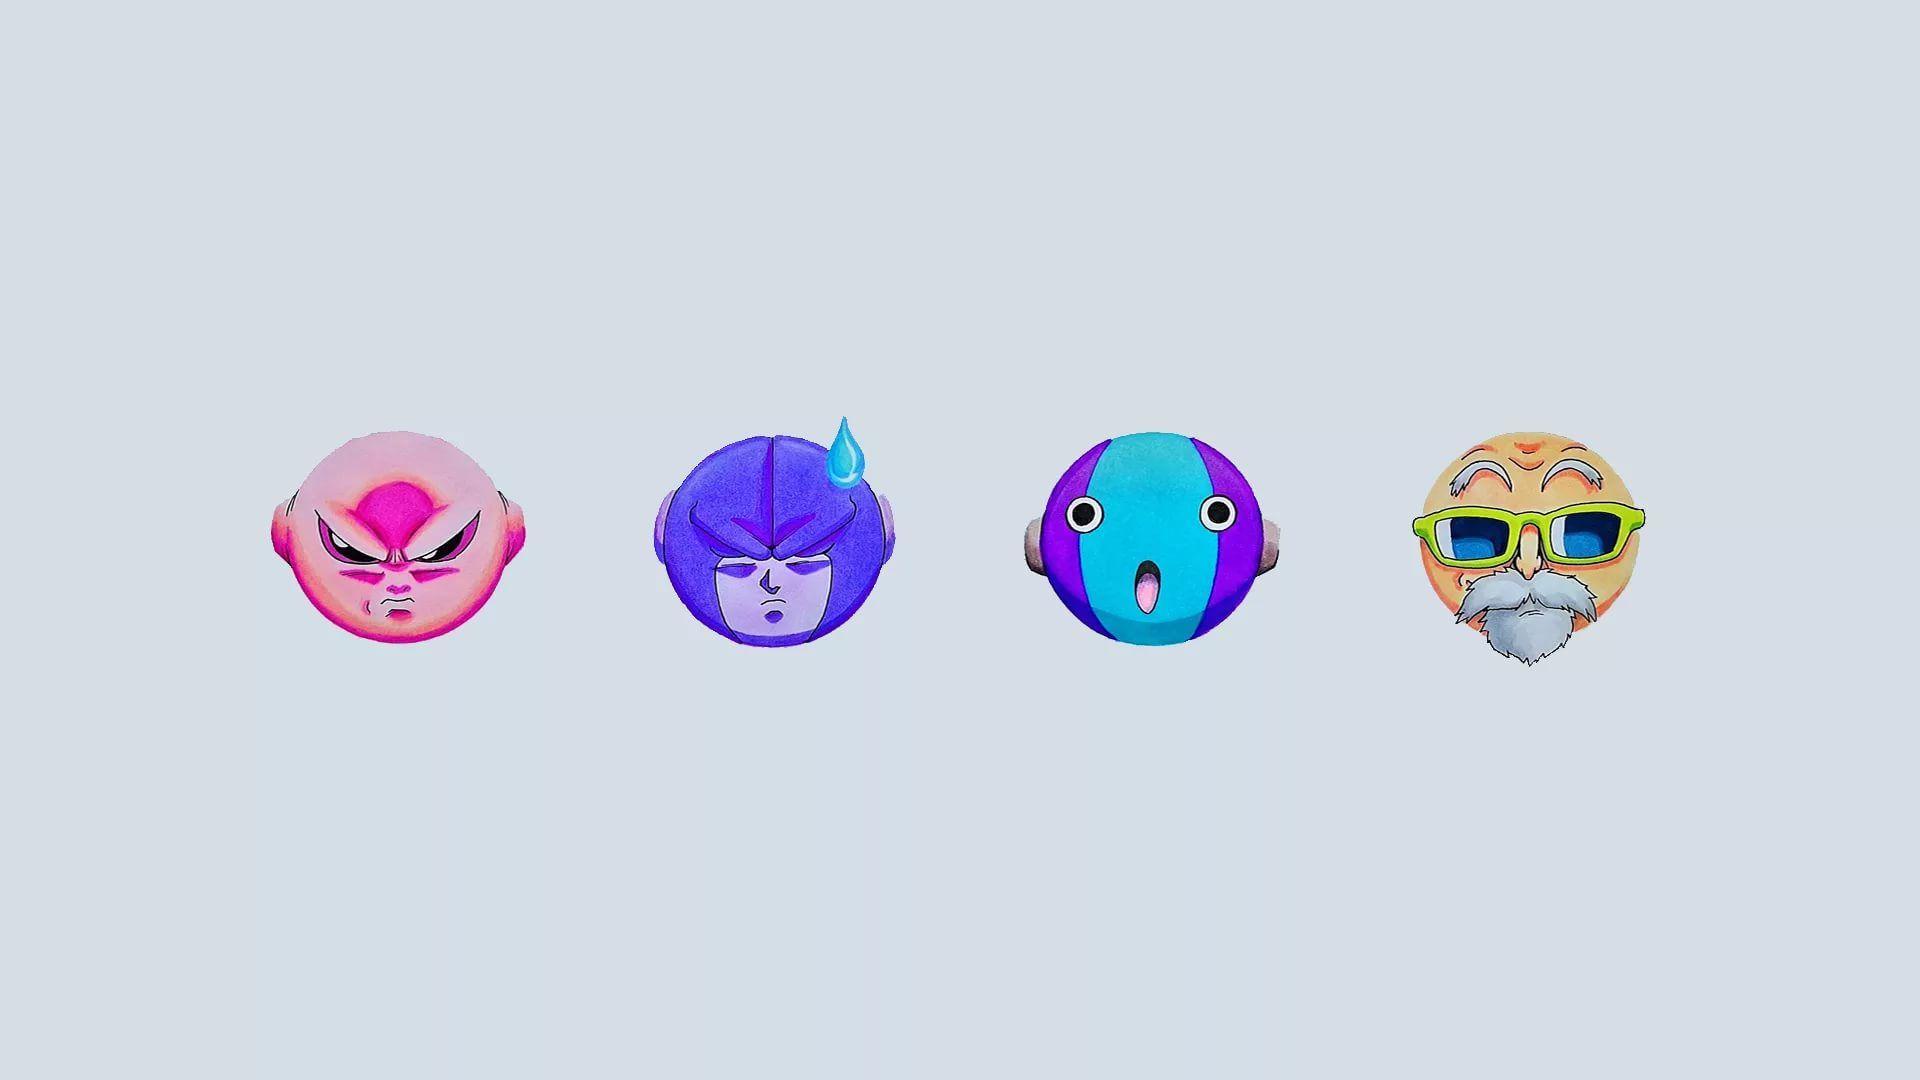 Cute Emoji Wallpaper and Background